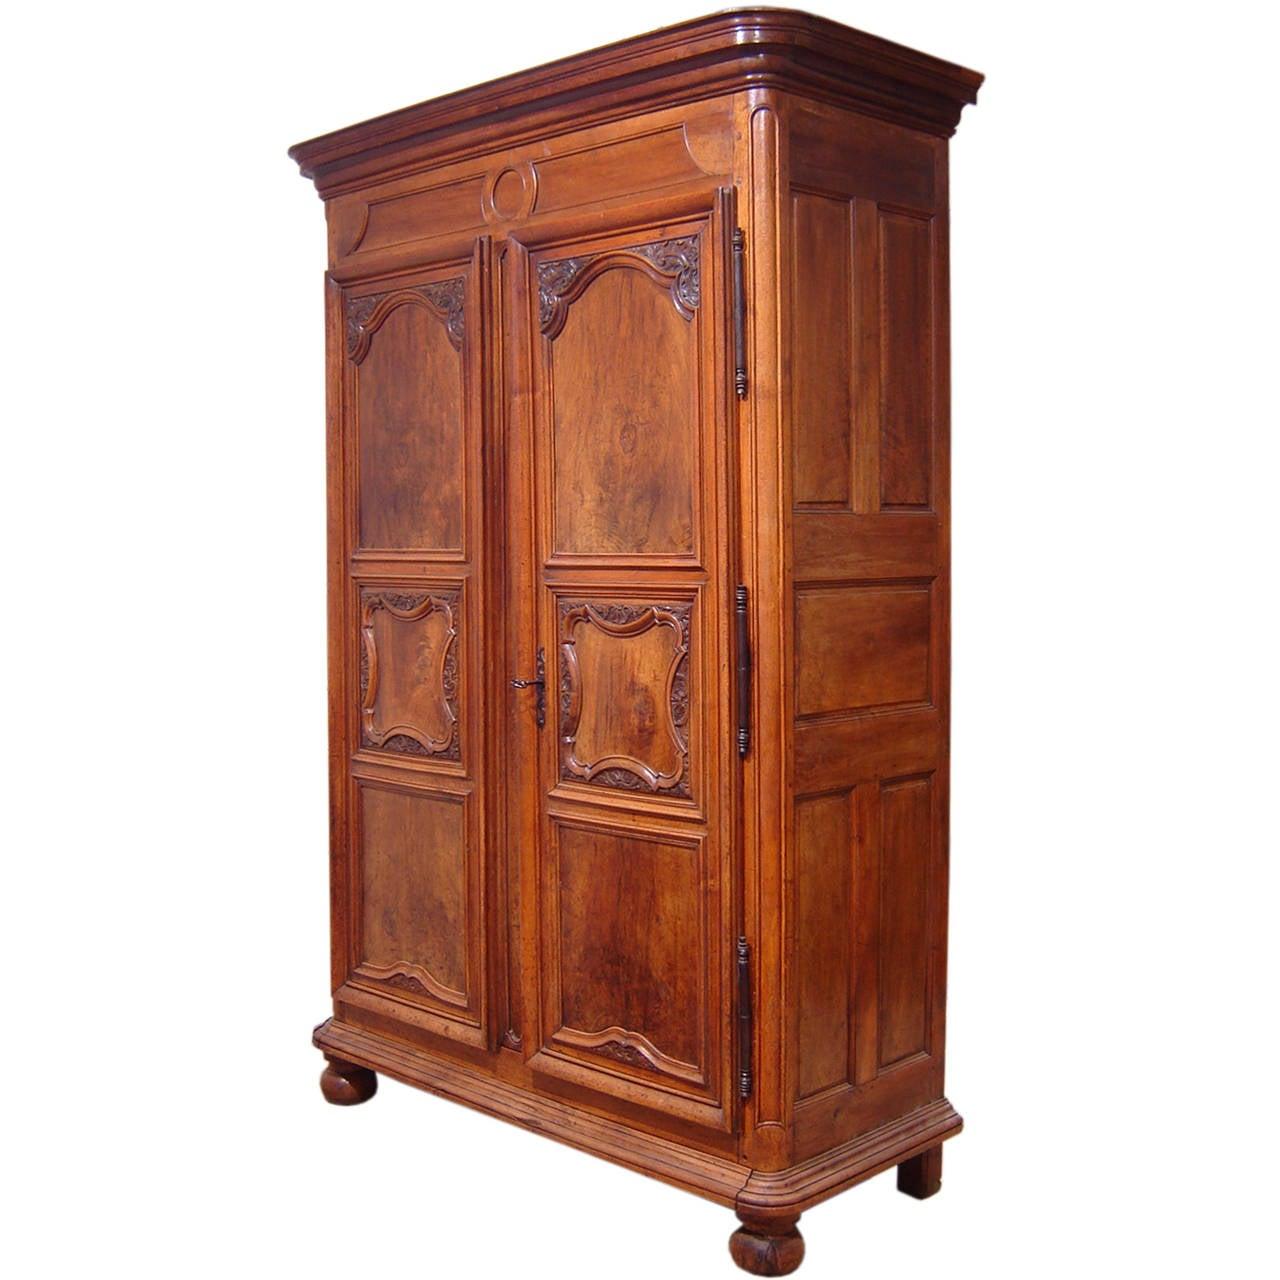 louis xiv walnut lyon cabinet at 1stdibs. Black Bedroom Furniture Sets. Home Design Ideas